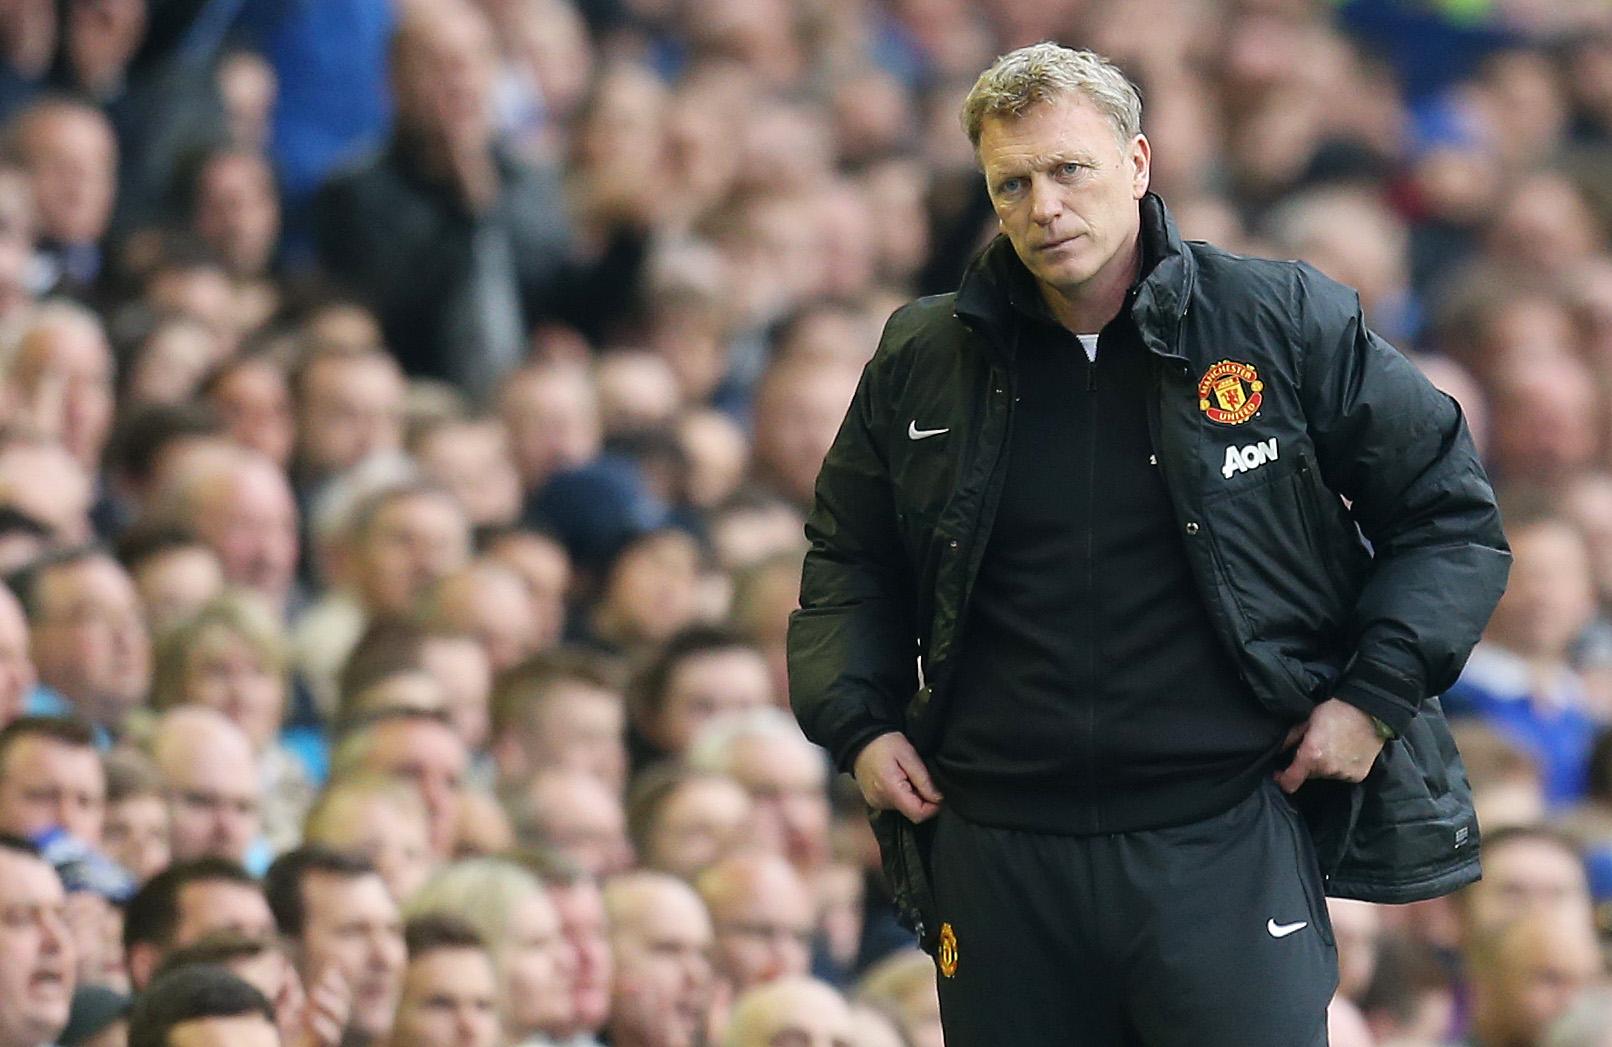 David Moyes Man United 2013